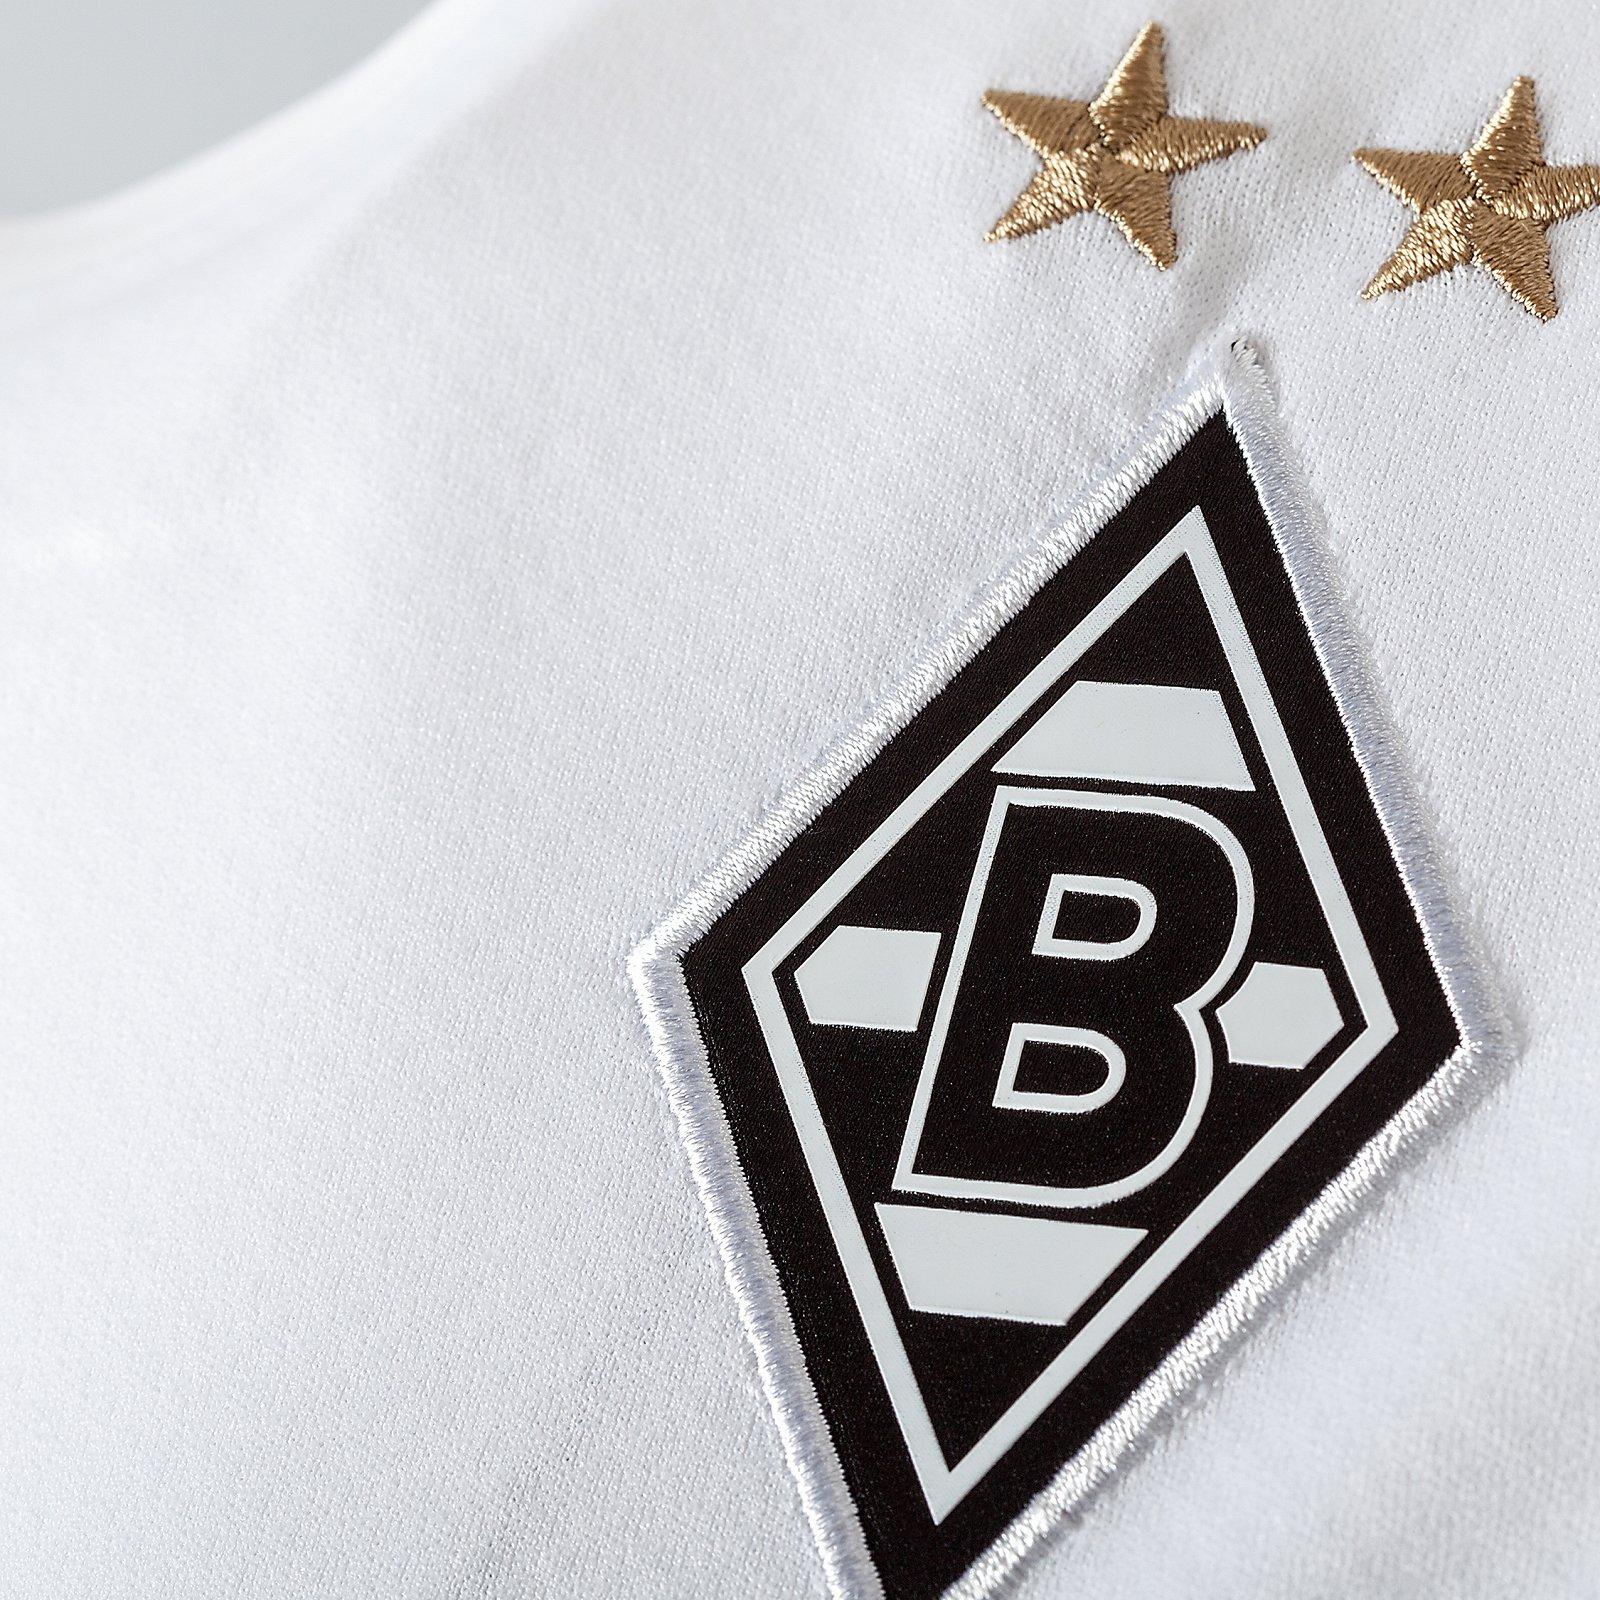 Borussia Mönchengladbach 2019-20 Puma Home Kit   19/20 ...